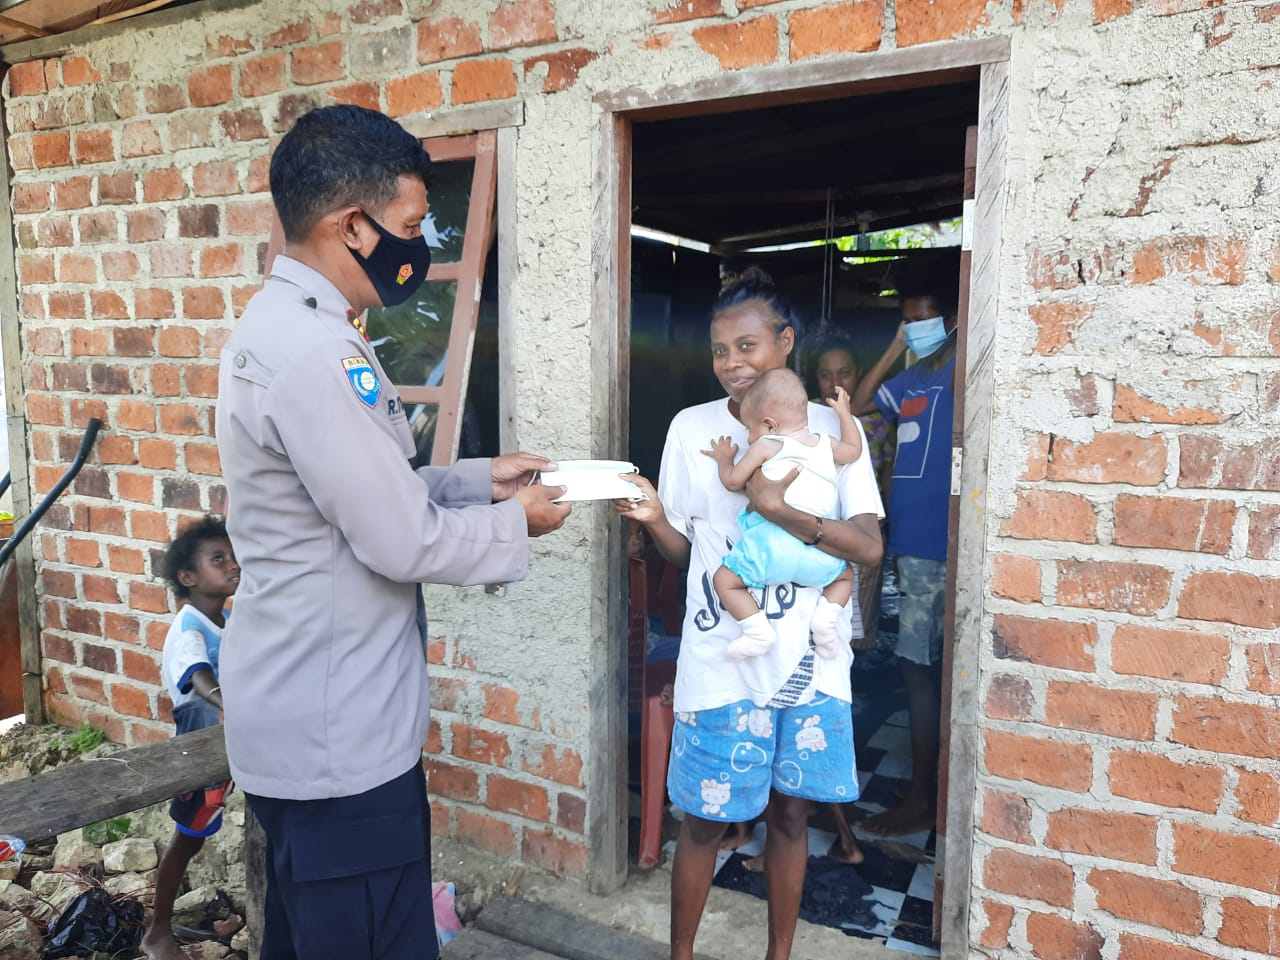 Satuan Binmas Dan Bhabinkamtibmas Berikan Himbauan Covid-19 Dan Bagikan Masker